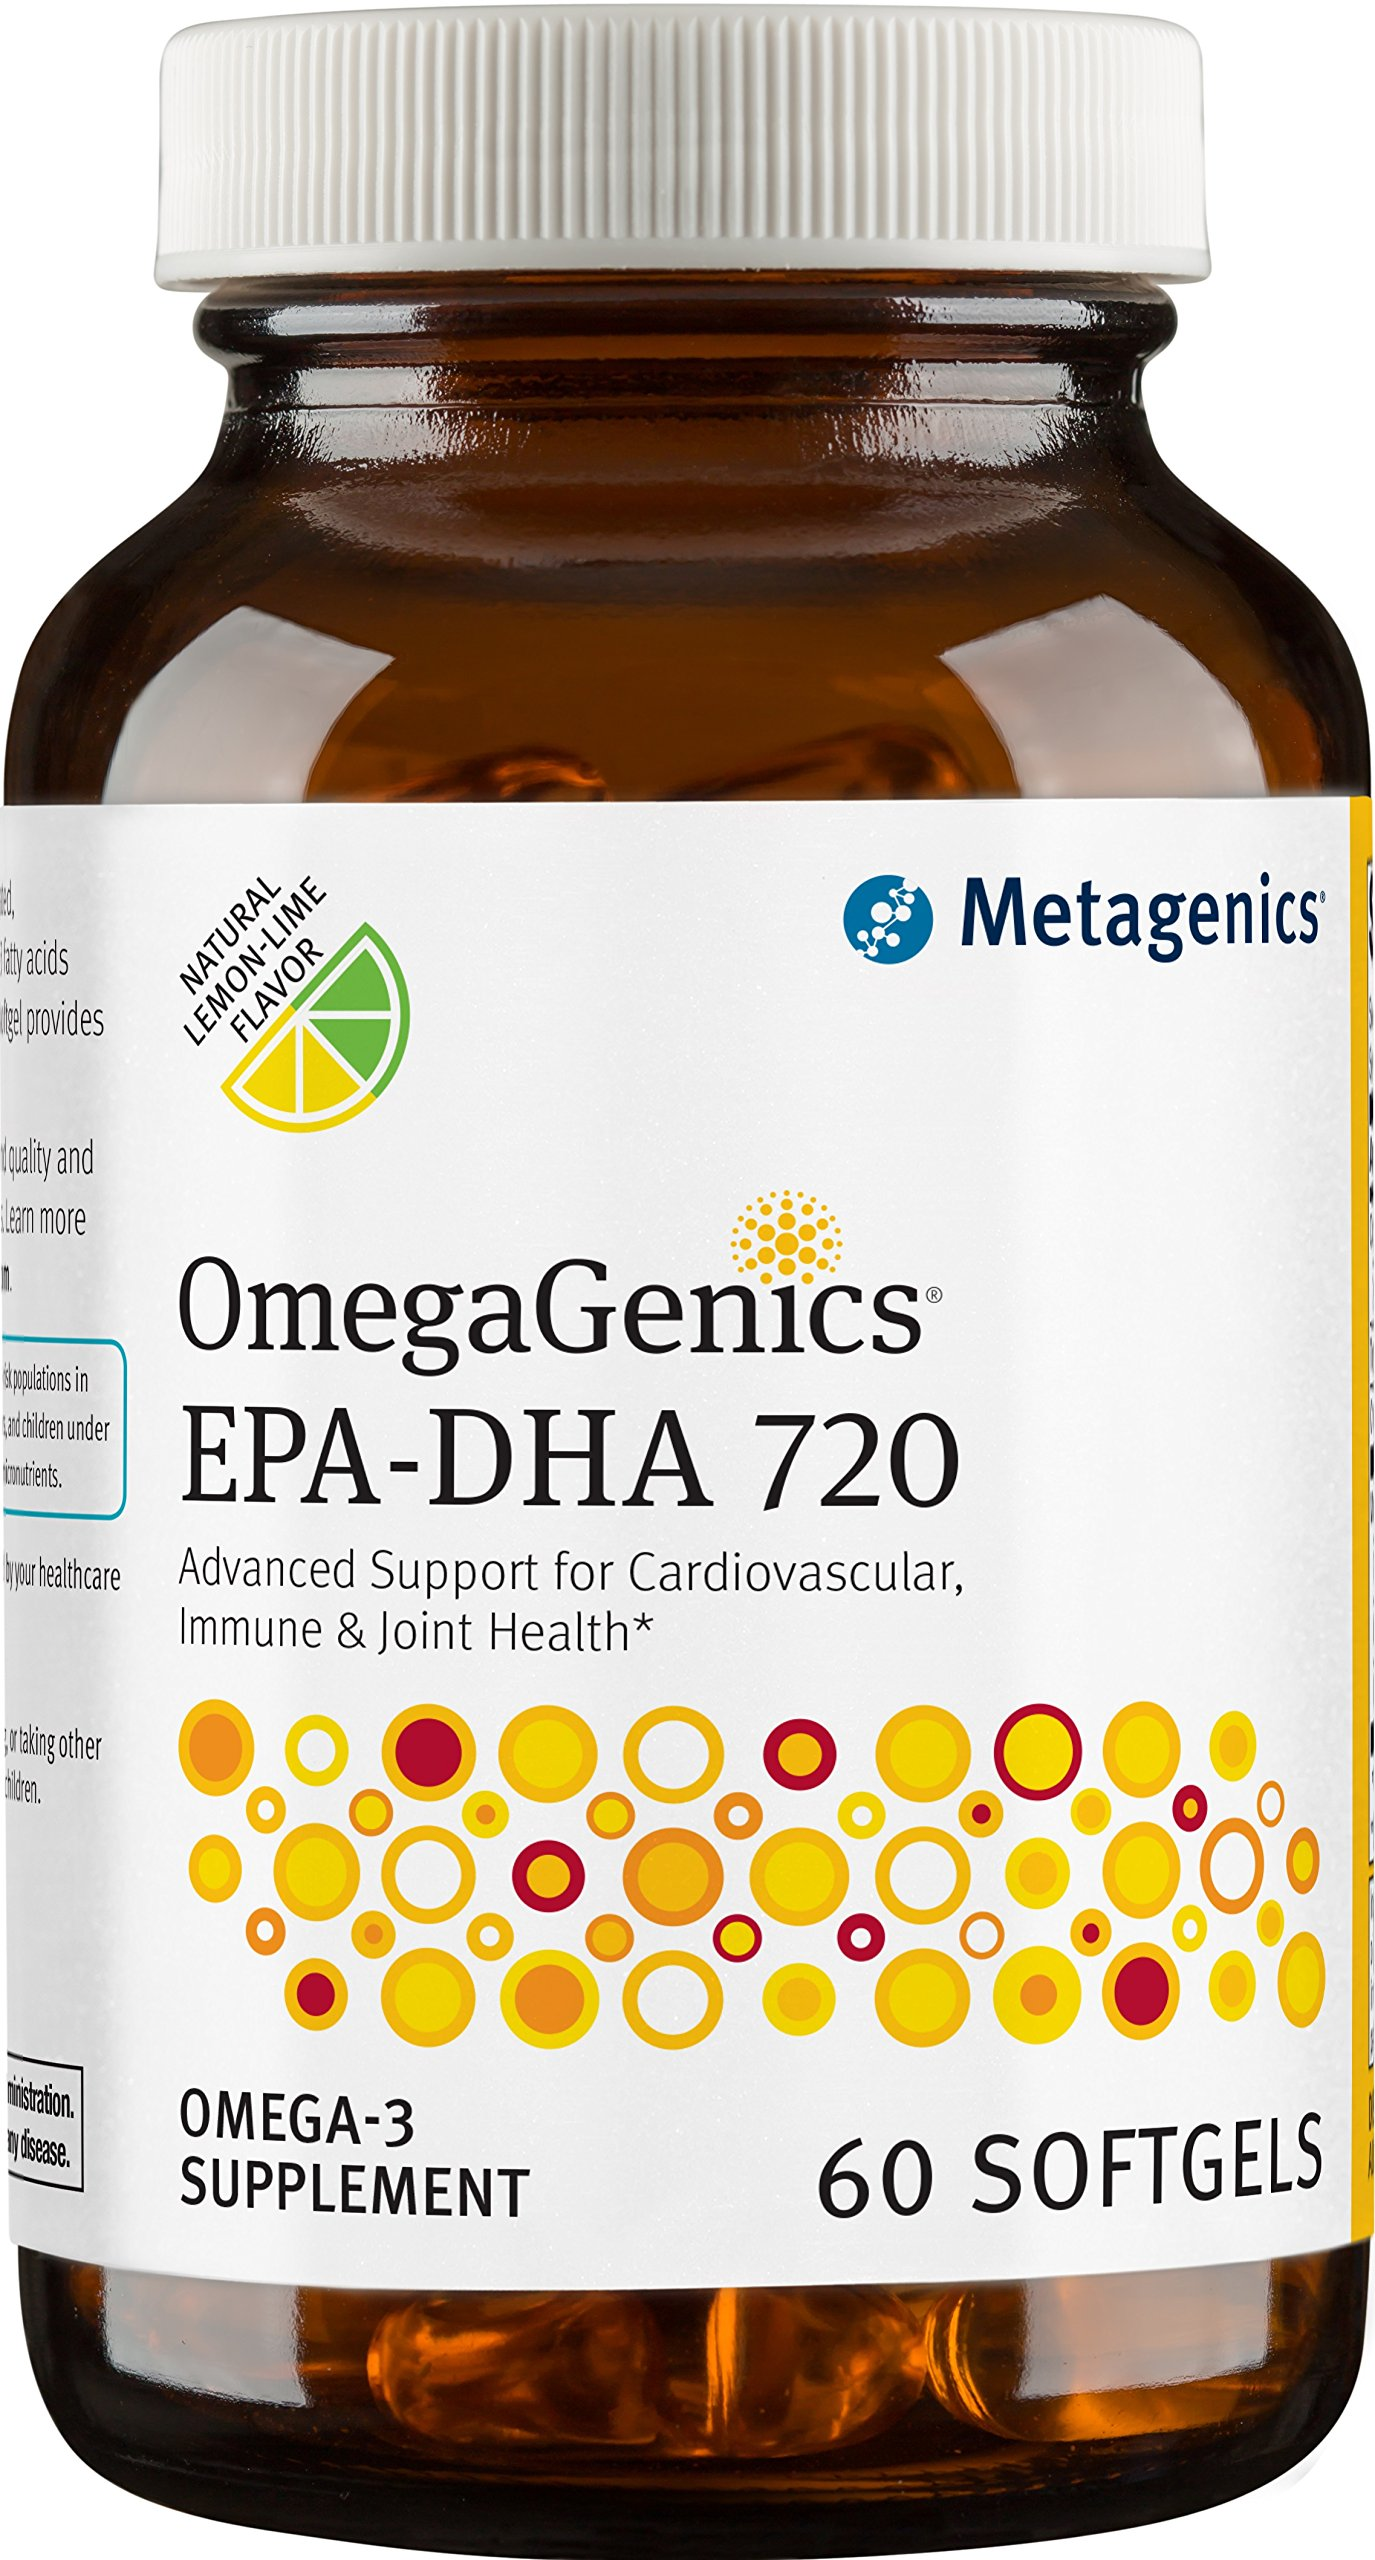 Metagenics - OmegaGenics EPA-DHA 720, 60 Count by Metagenics